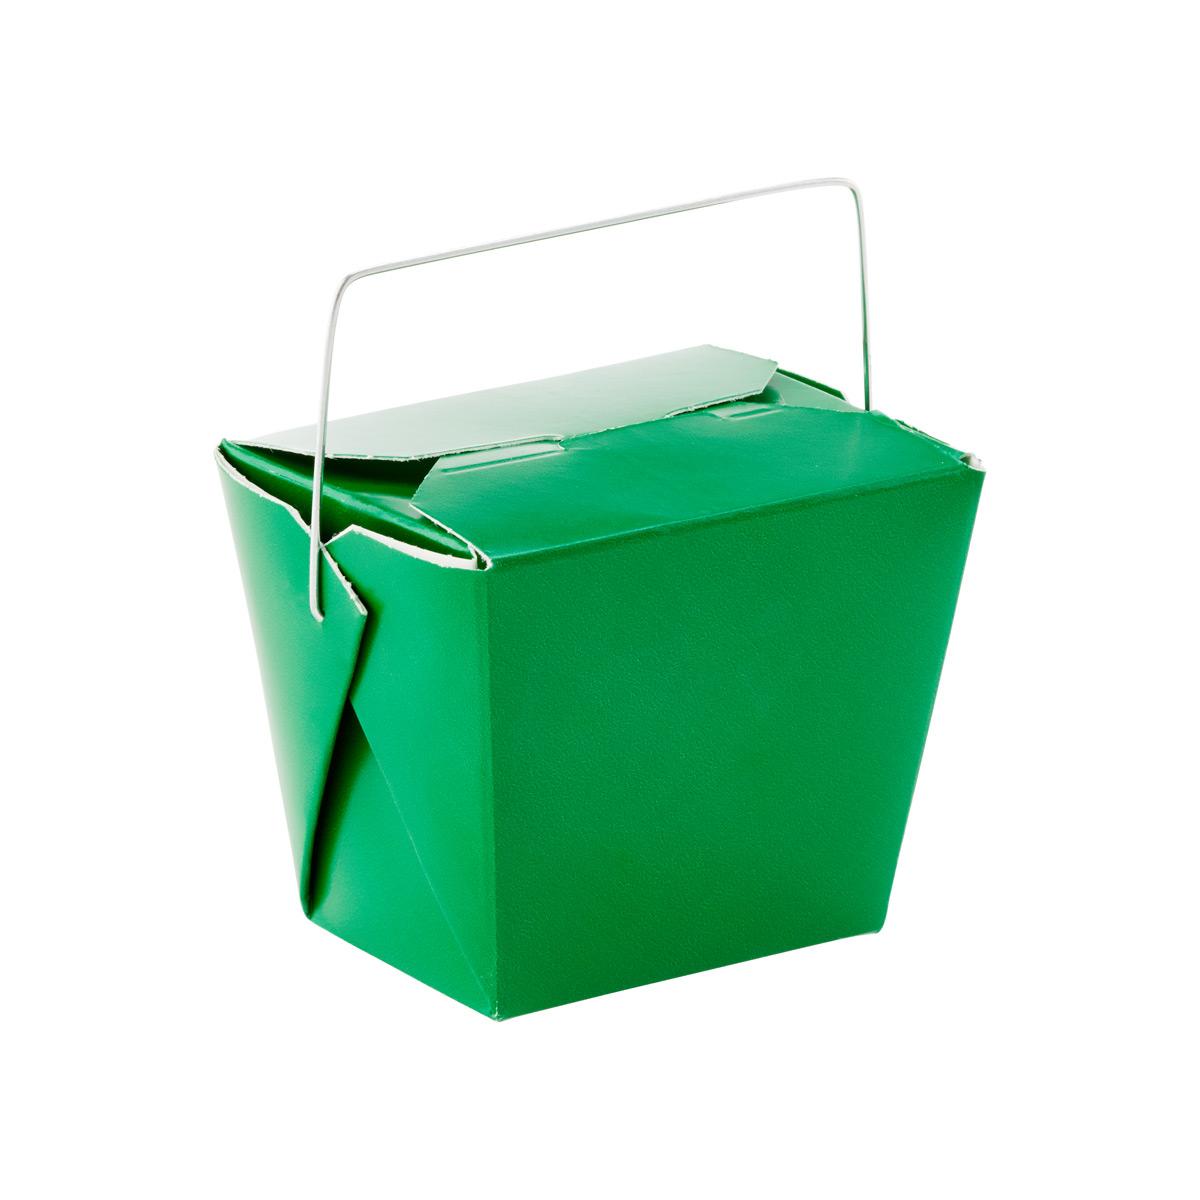 Take-Out Carton